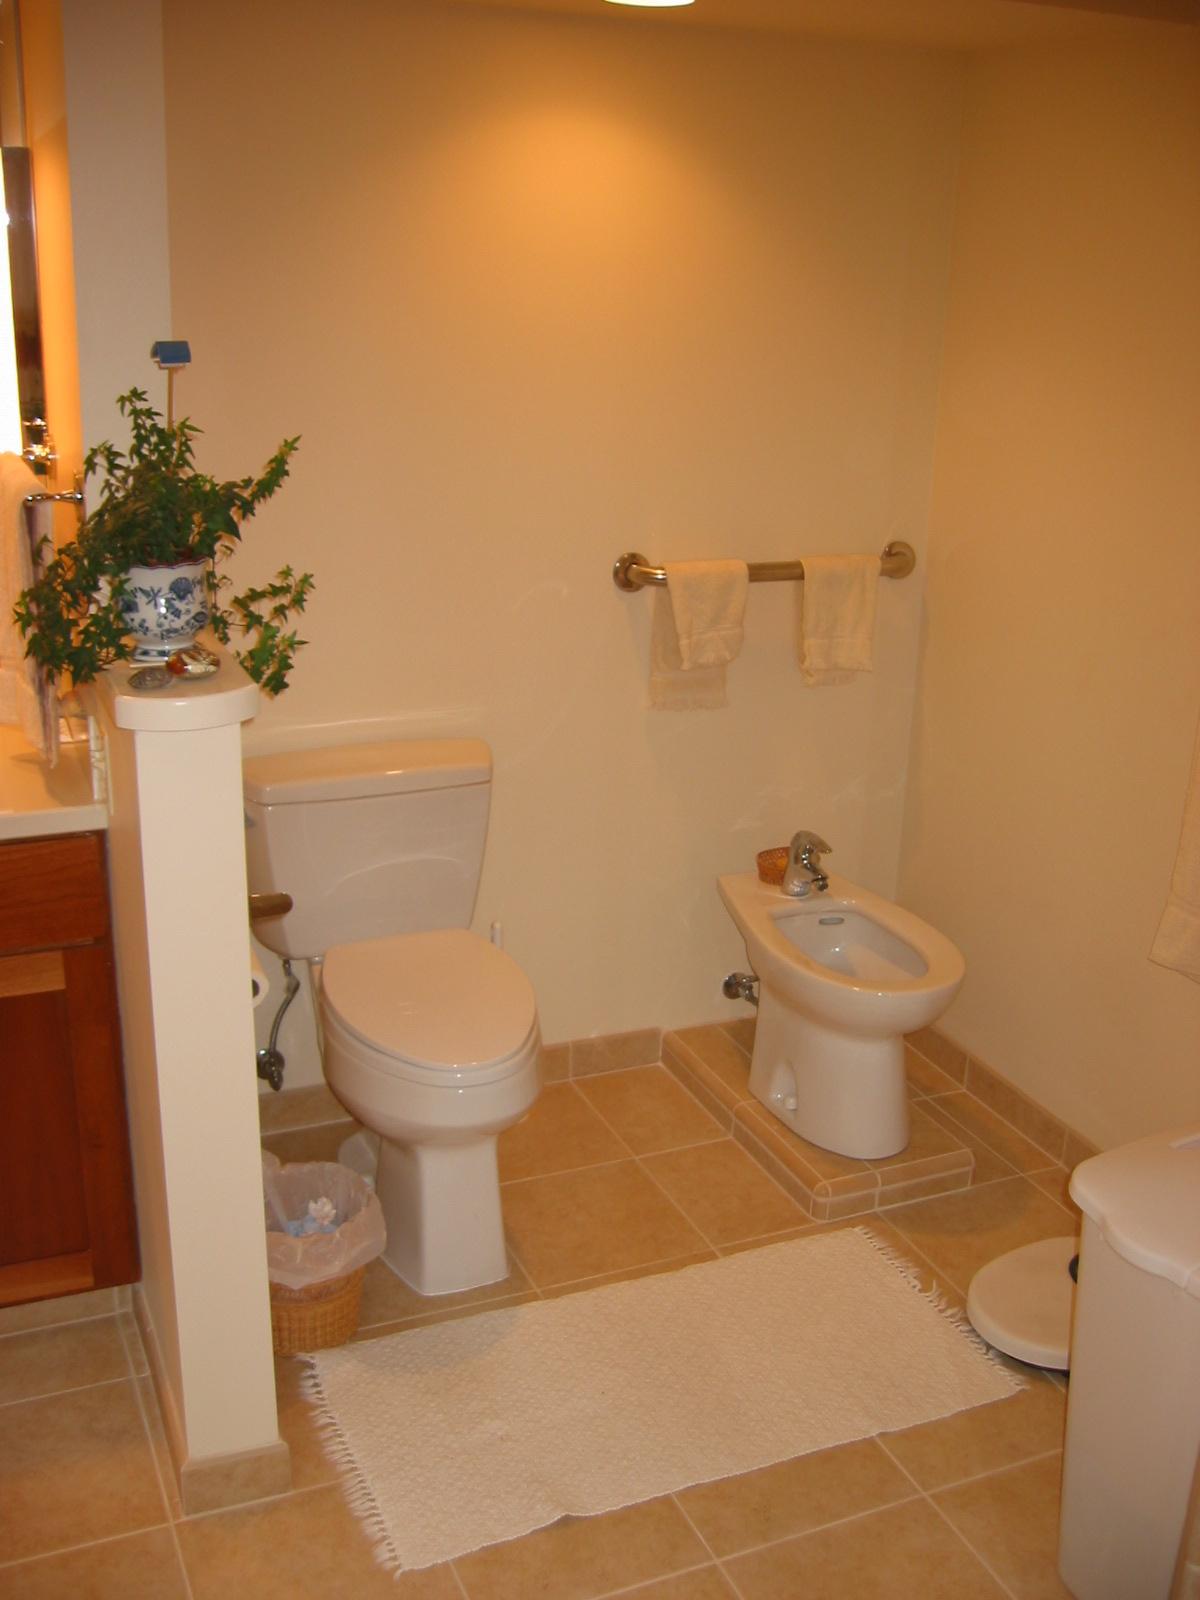 New bidet and toilet location